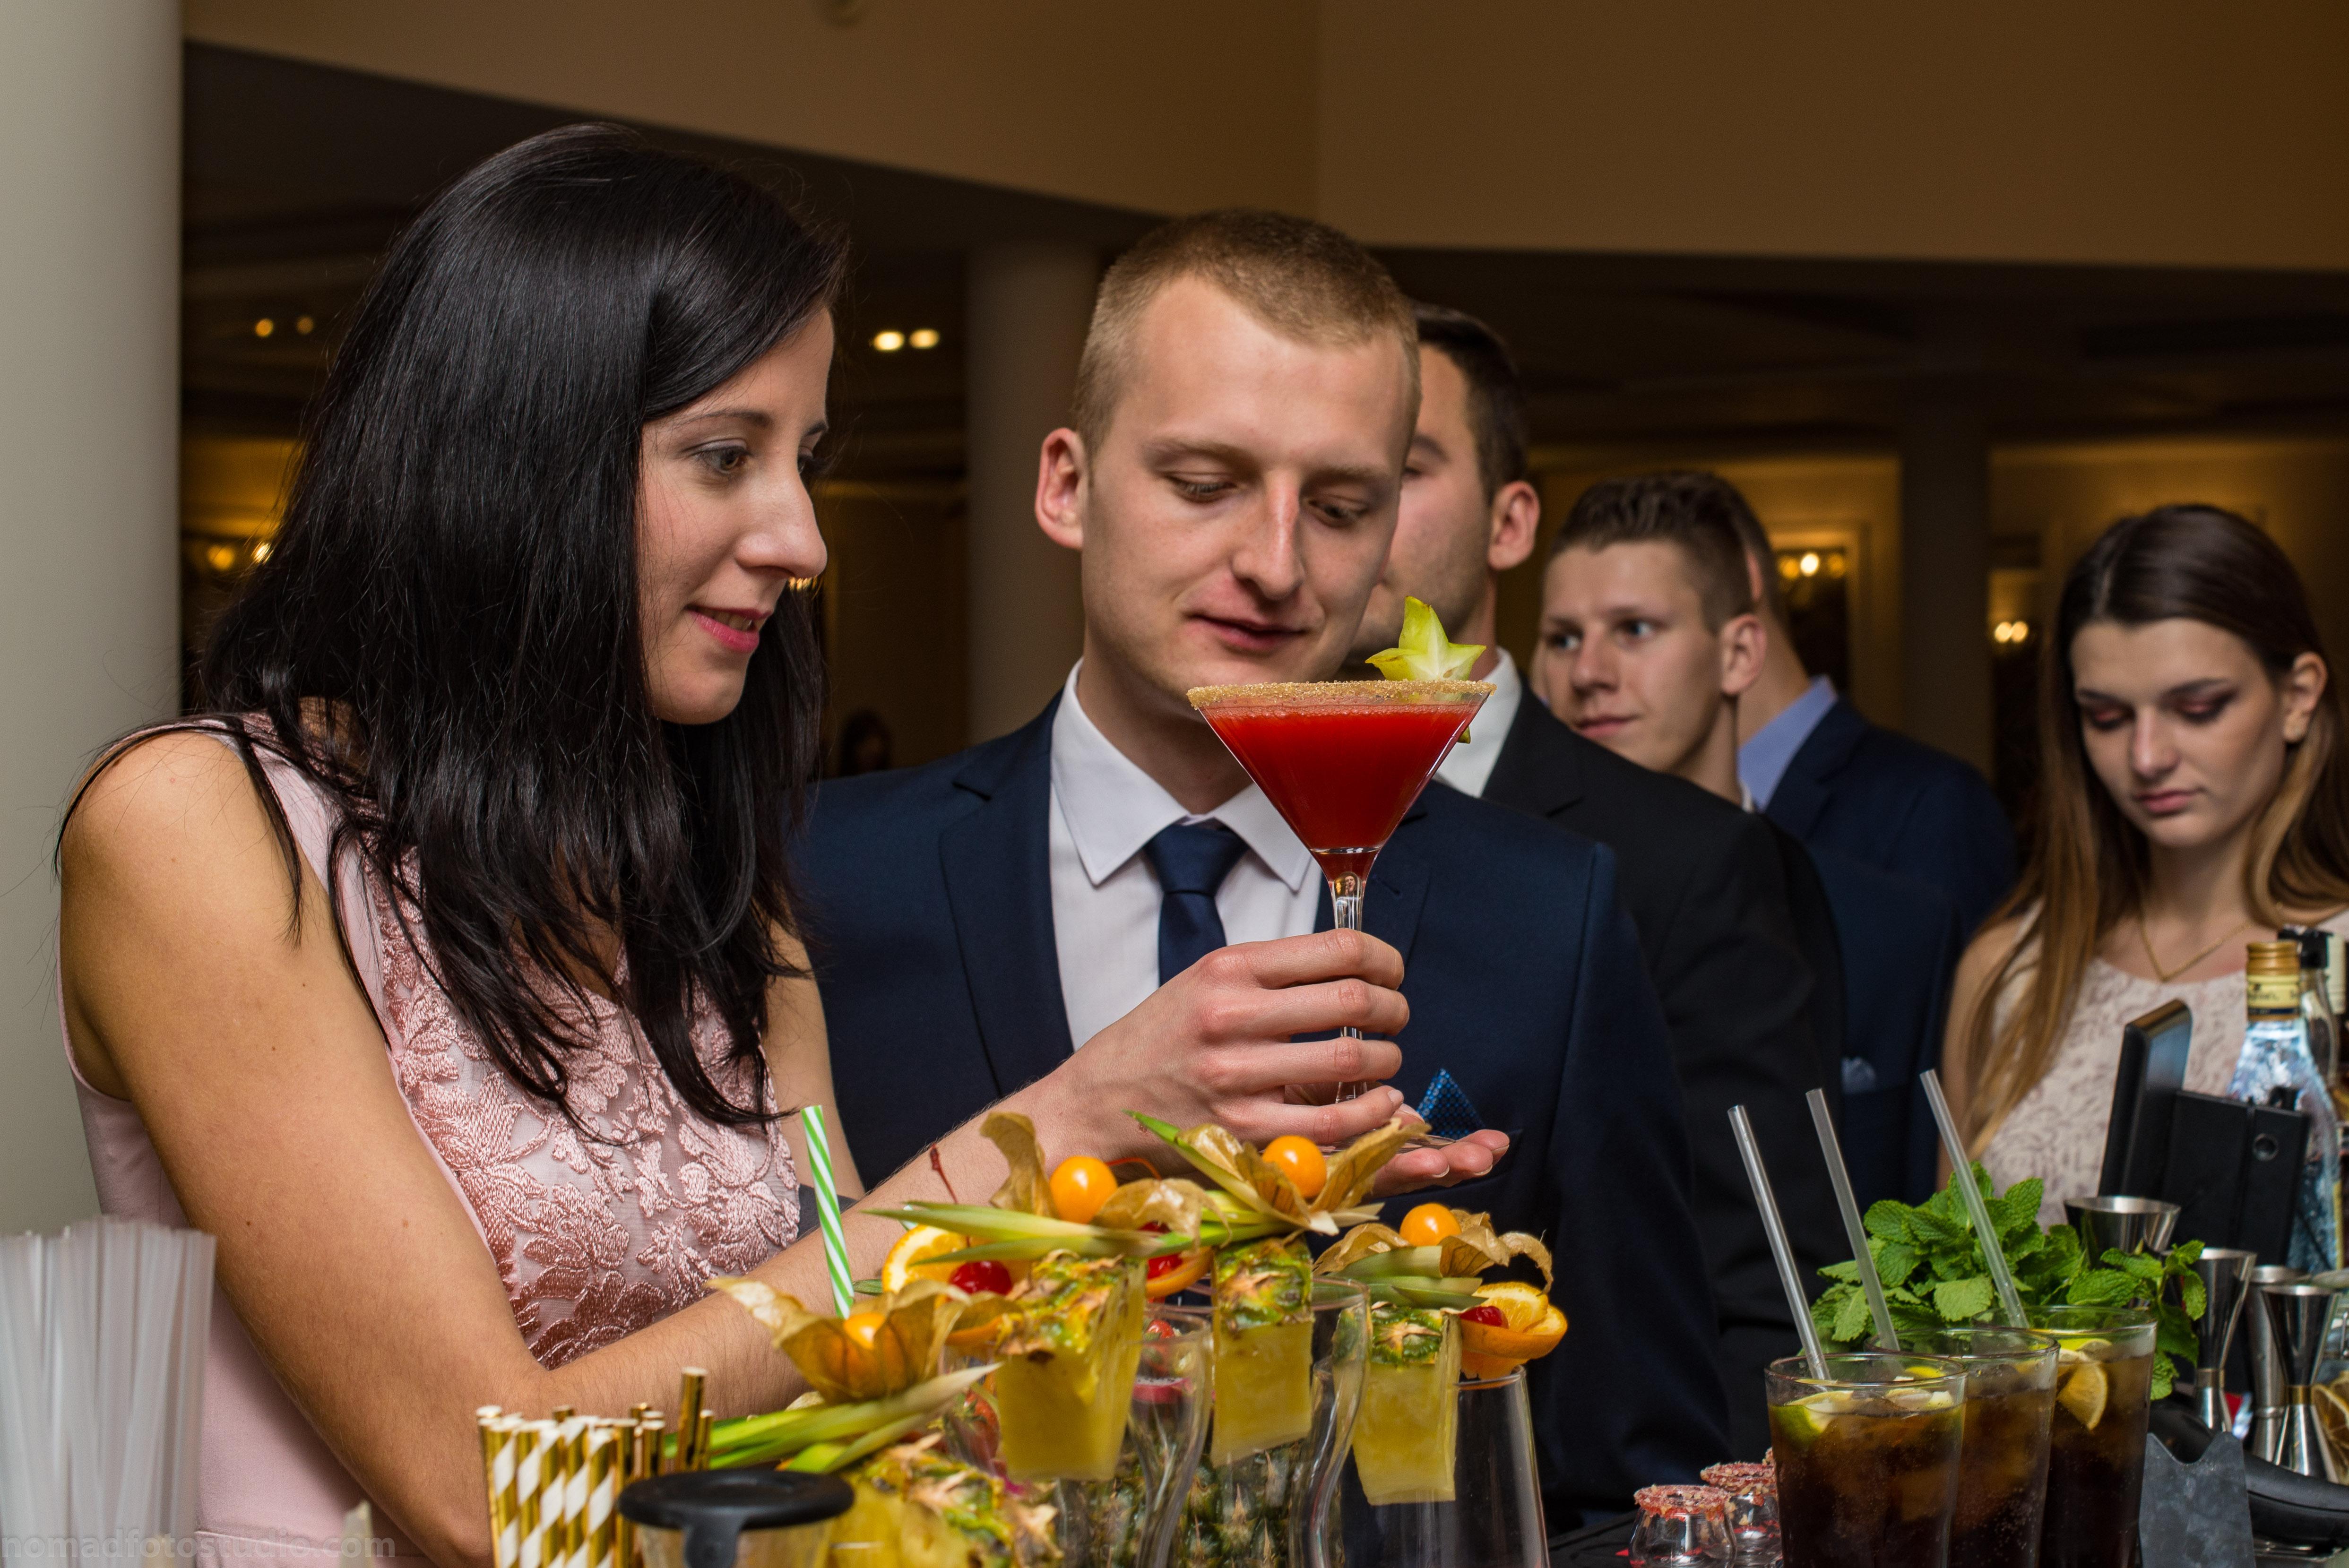 Siedlce-drink-bar-mobilny-barman-na-wesele-evet-agencja-barmańska-drinki-13